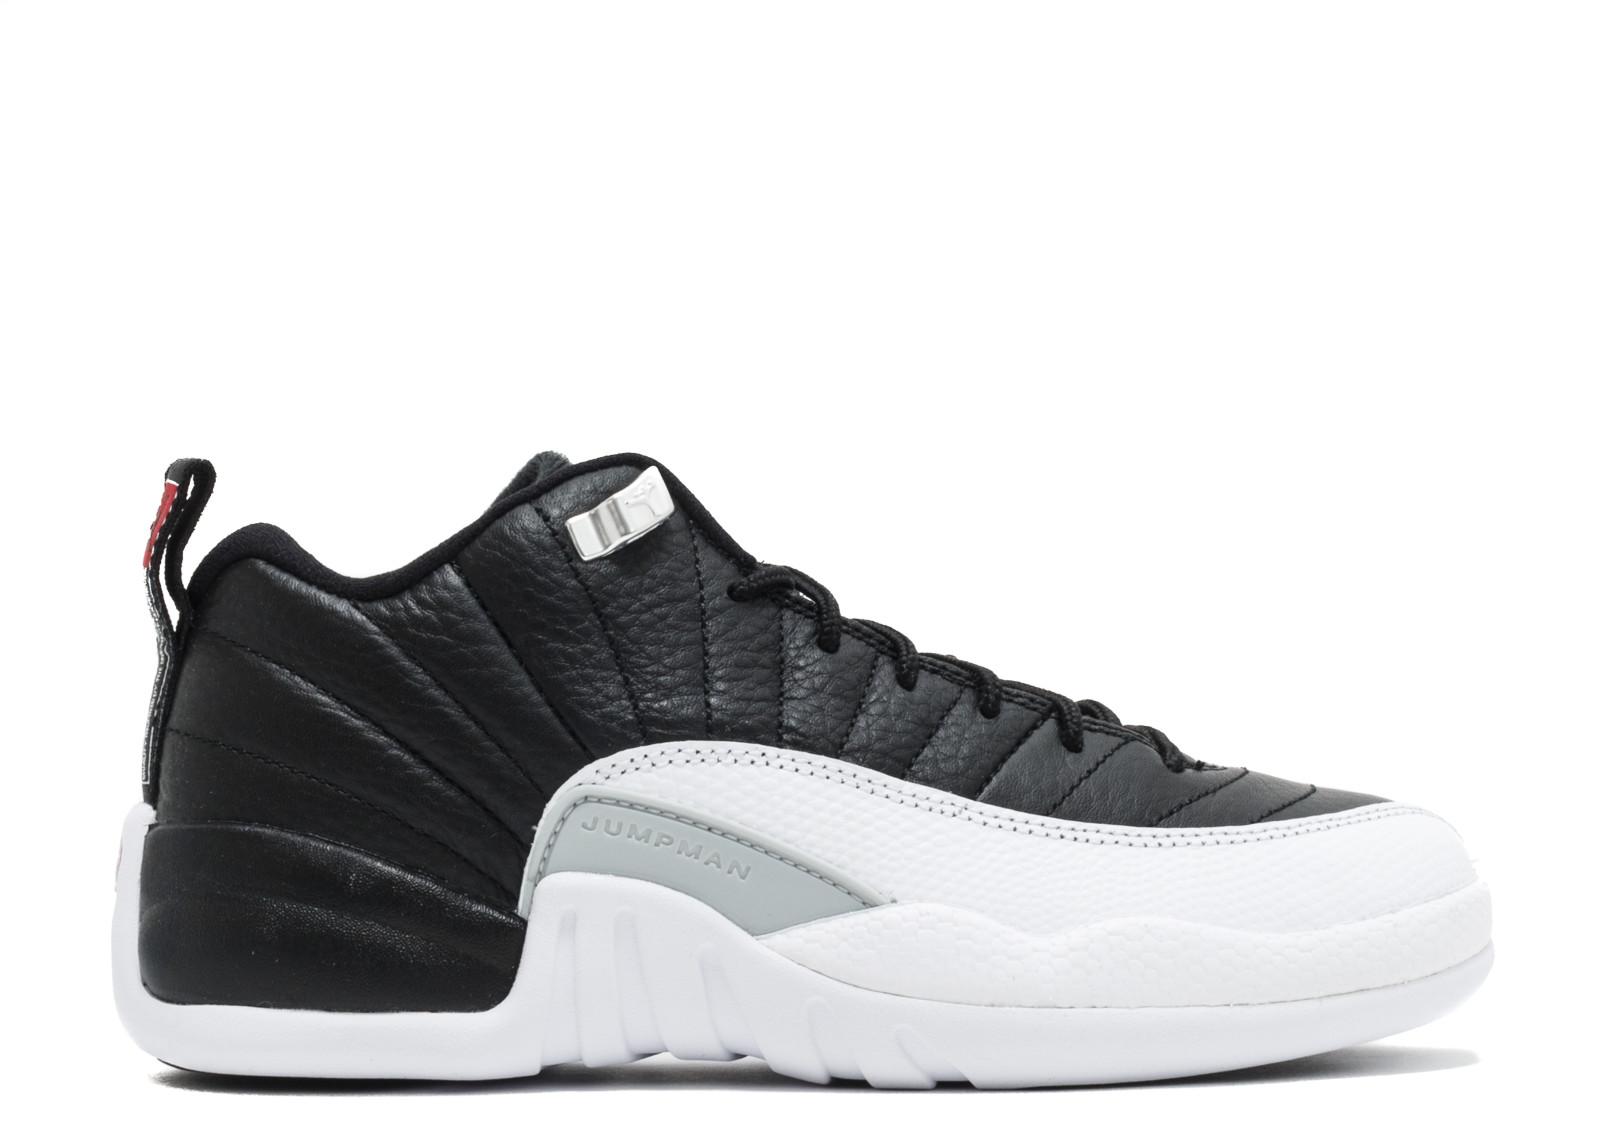 Nike Air Max és Utcai cipő  Nike Air Jordan 12 Retro Low (GS) 6f6f17104c